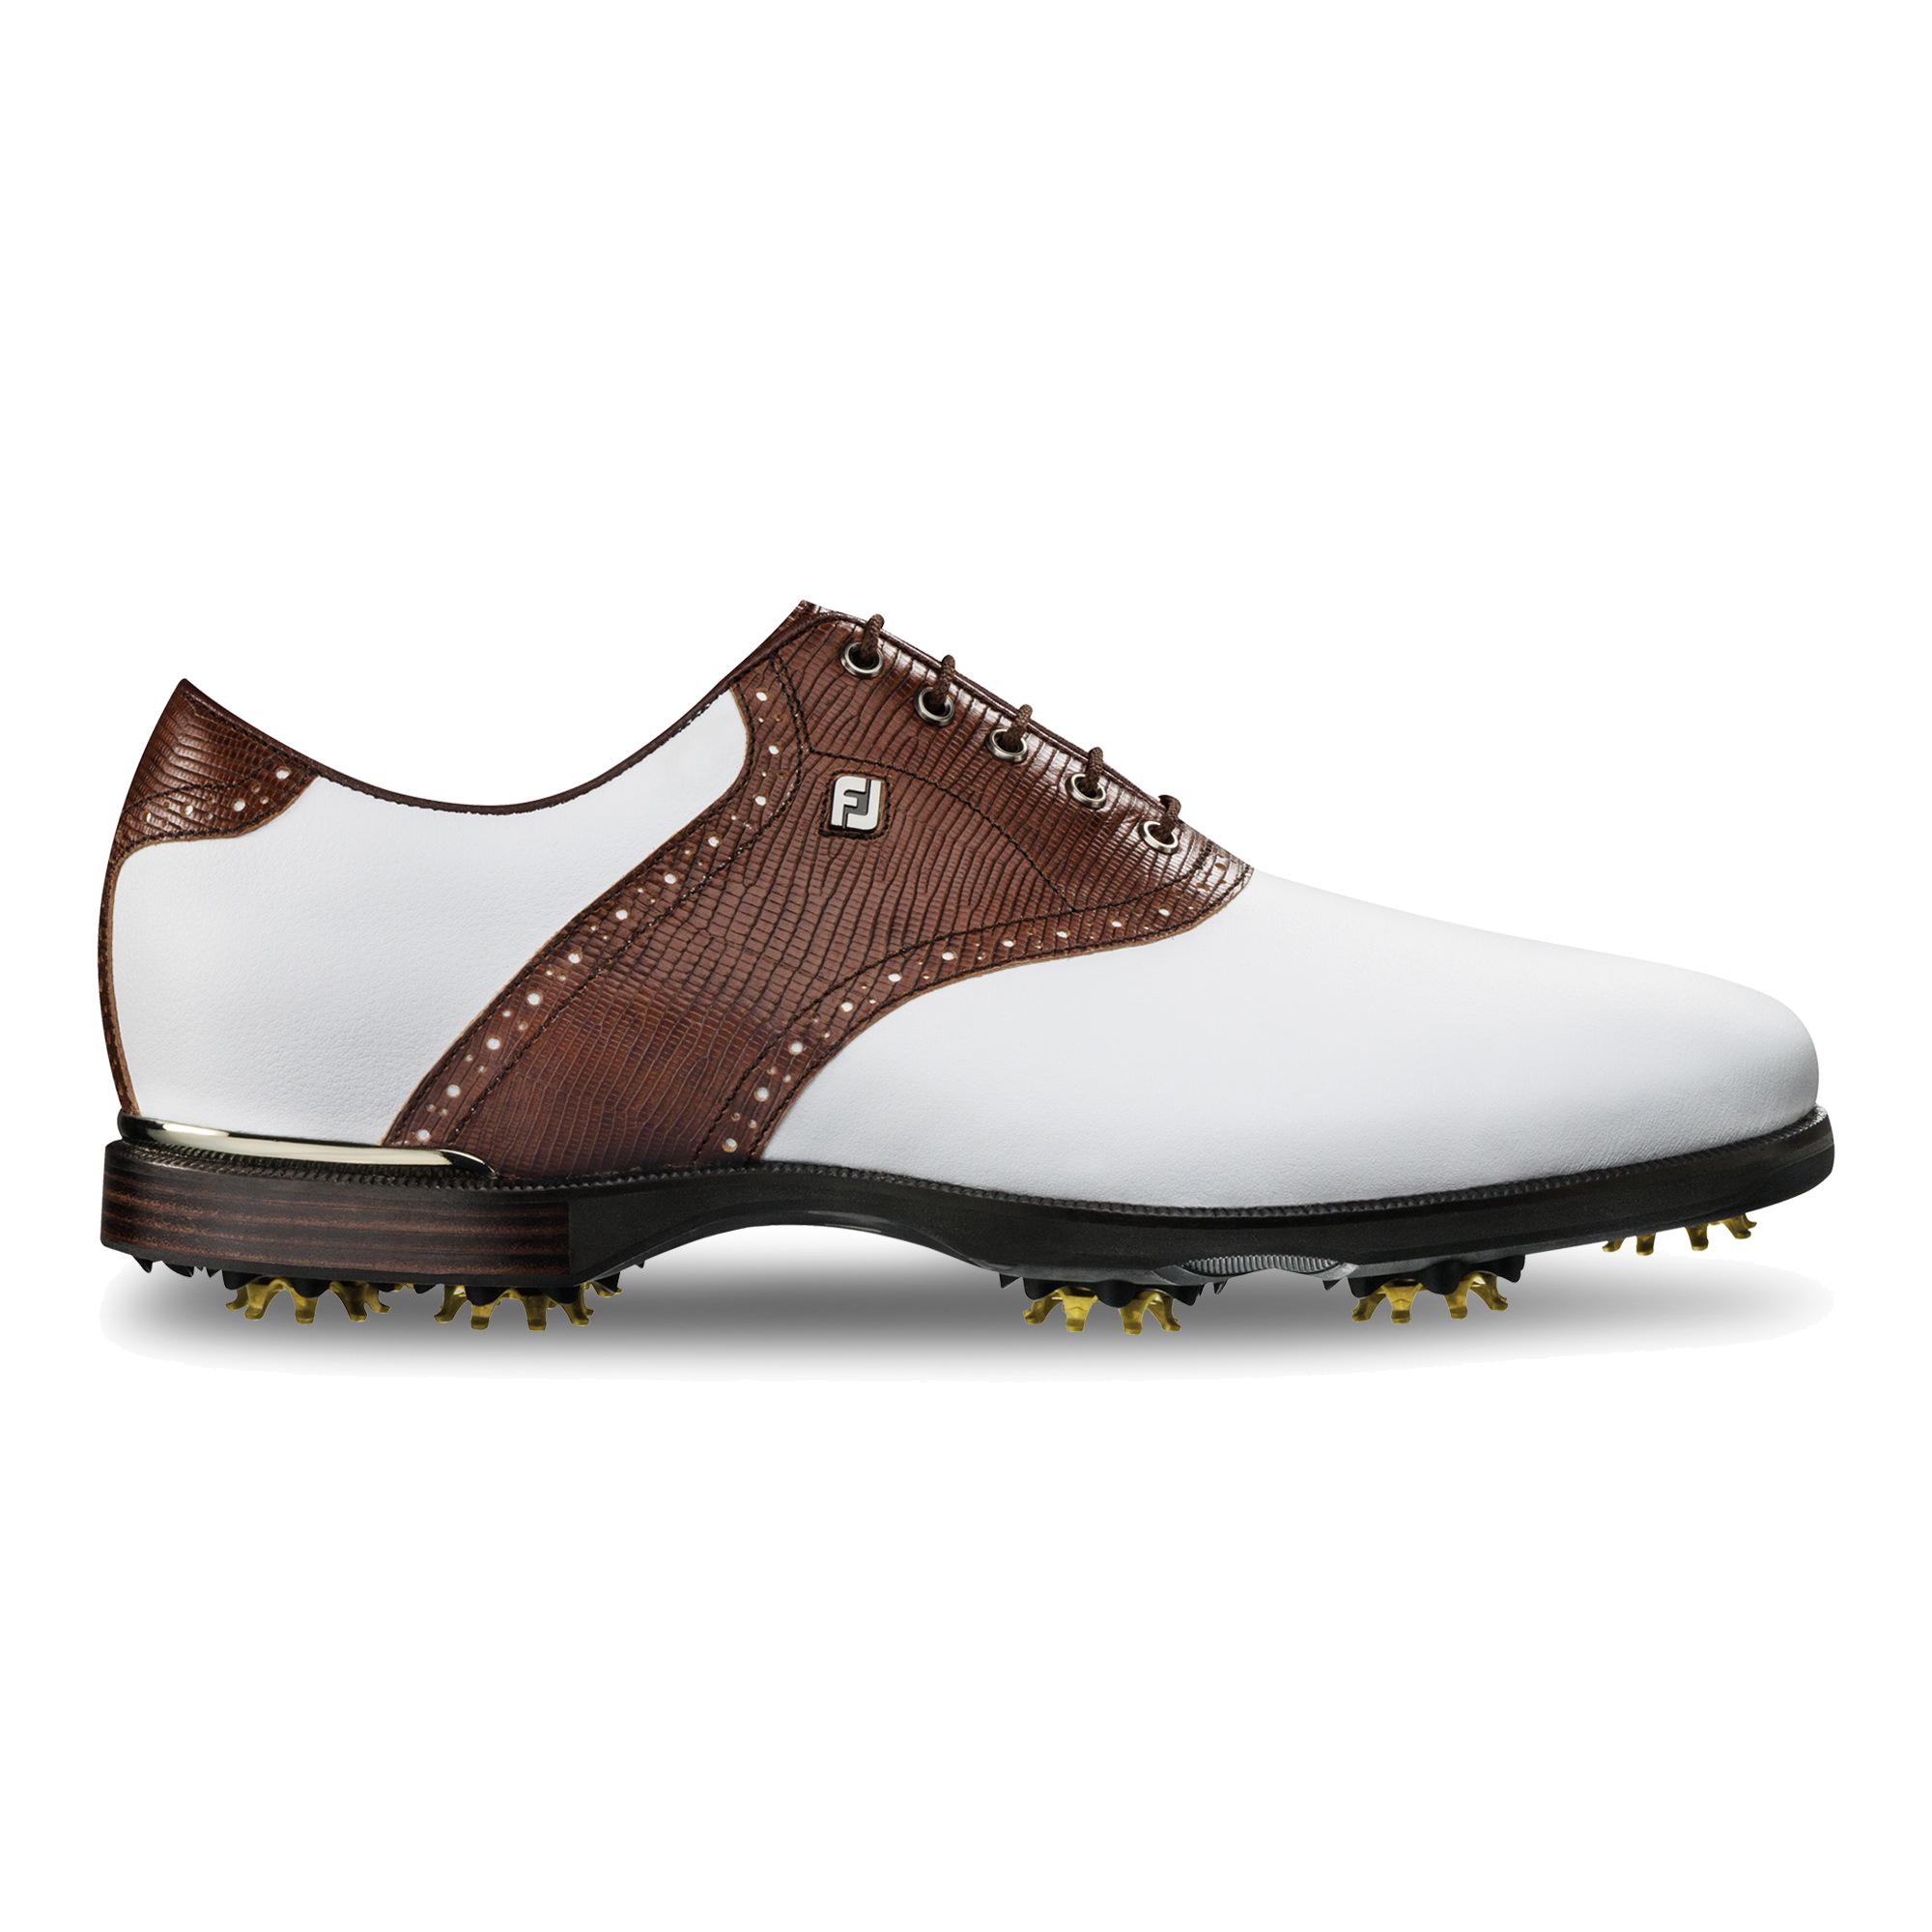 ICON Black | Men's Classic Saddle Golf